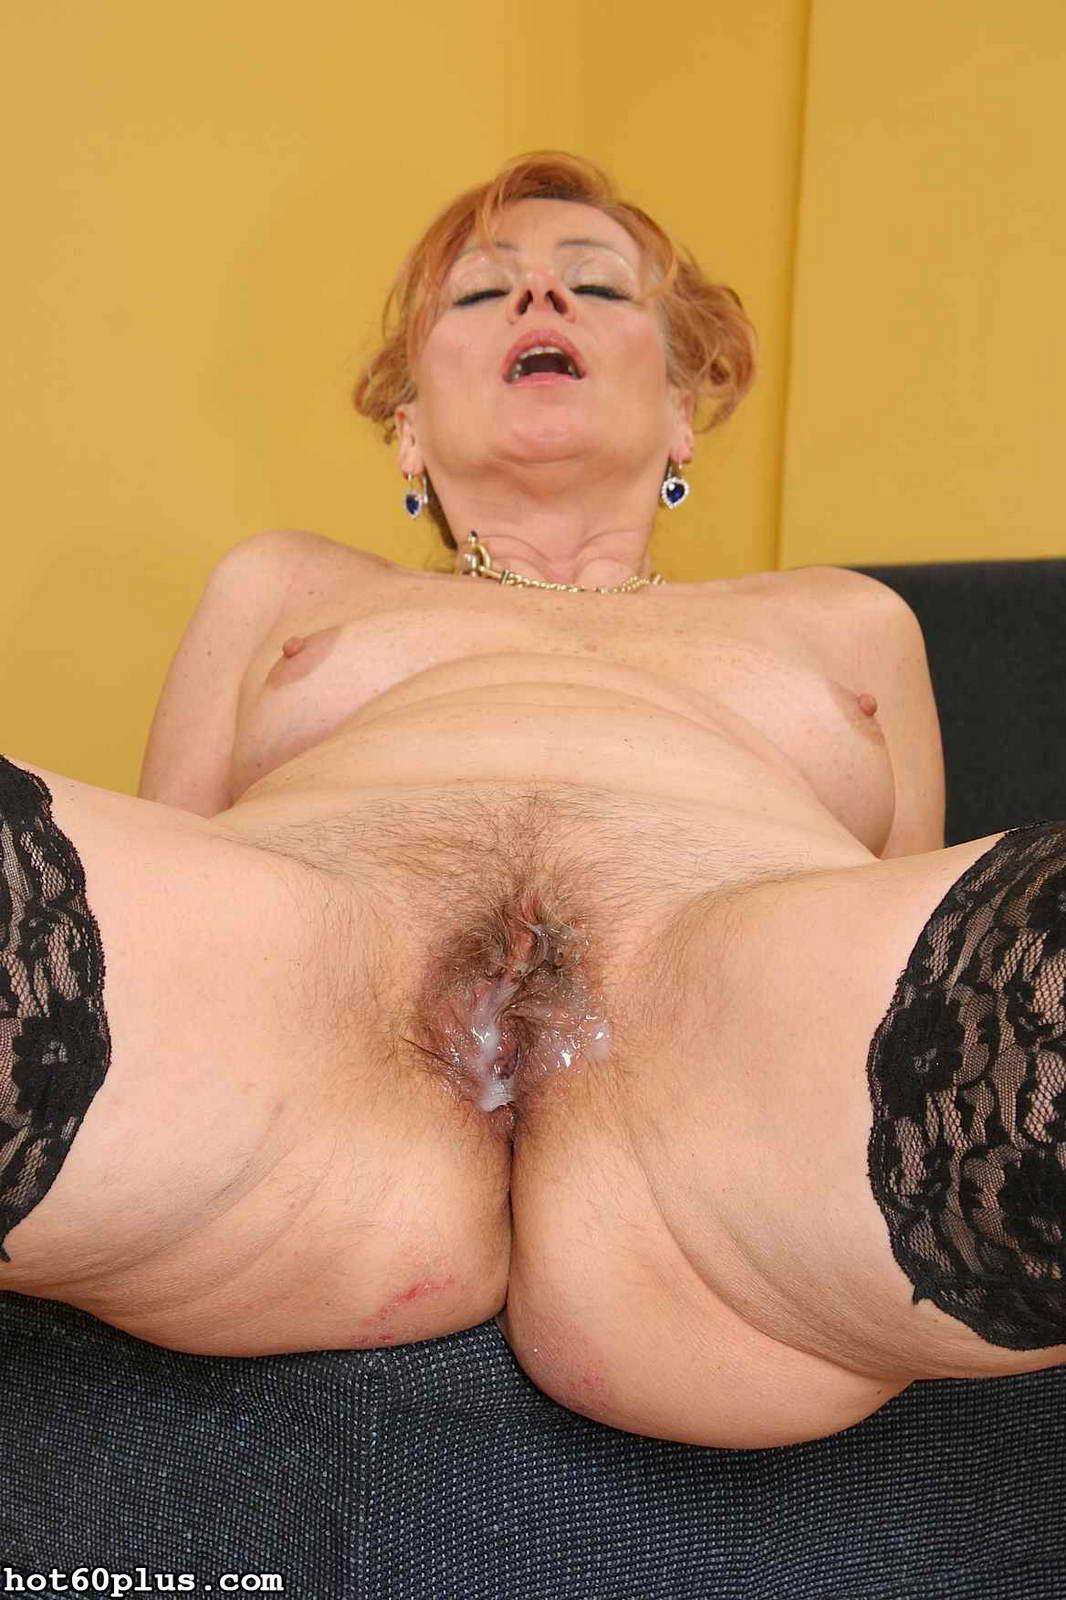 Қазақша секс порно 13 фотография